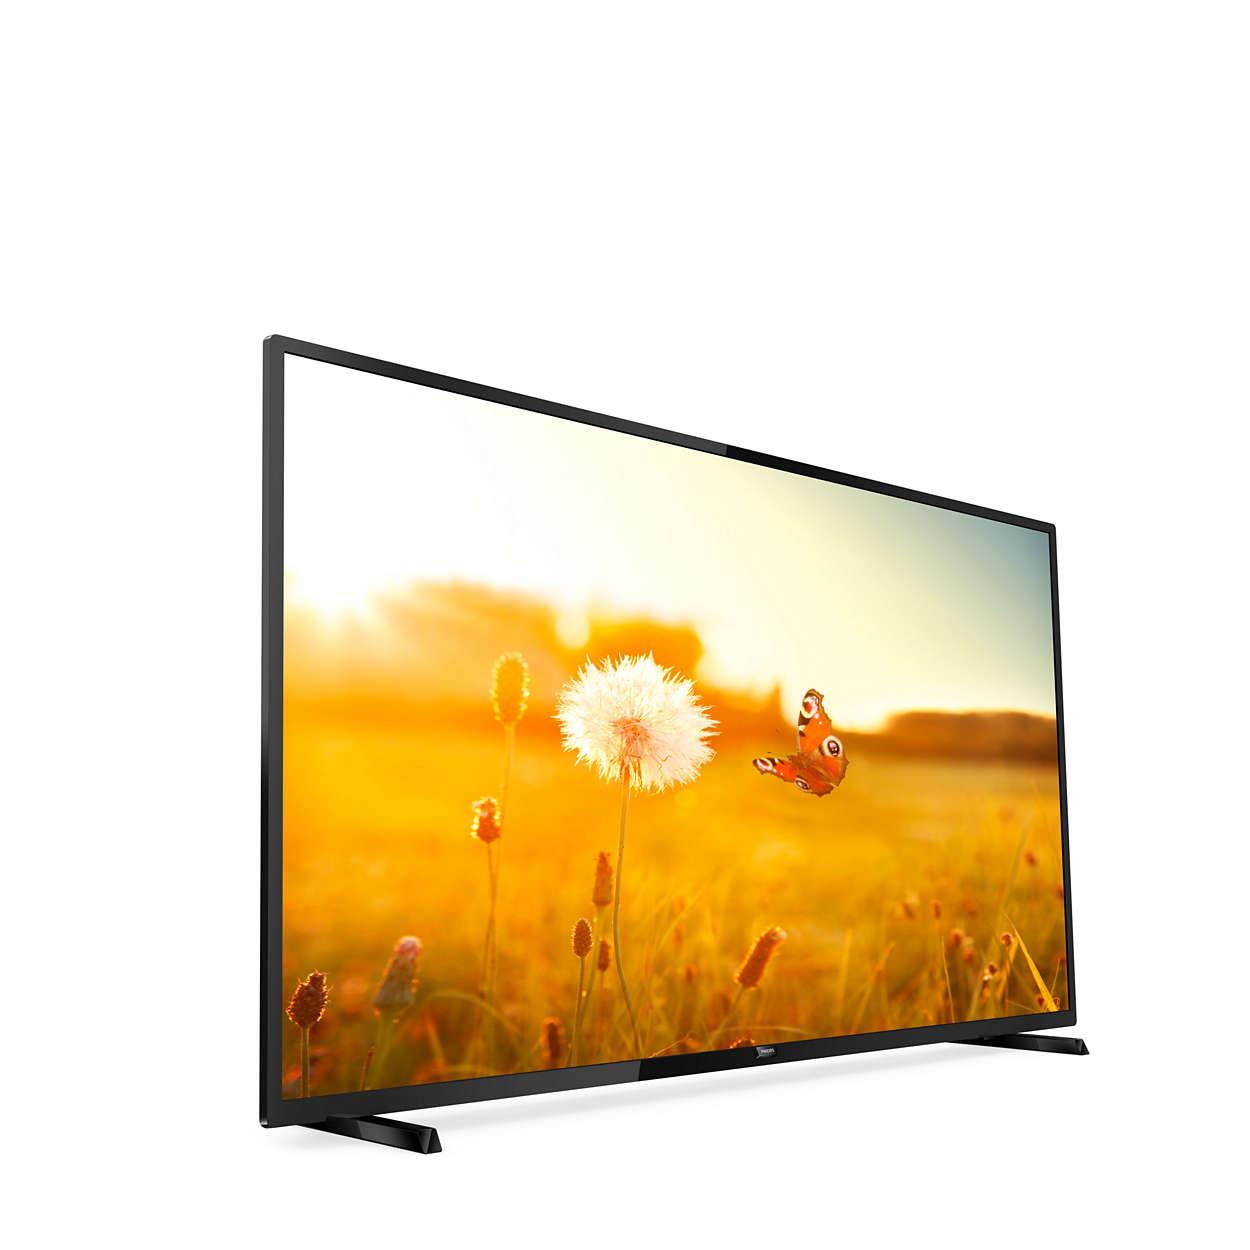 50'' HTV Philips 50HFL3014 - EasySuite - 50HFL3014/12